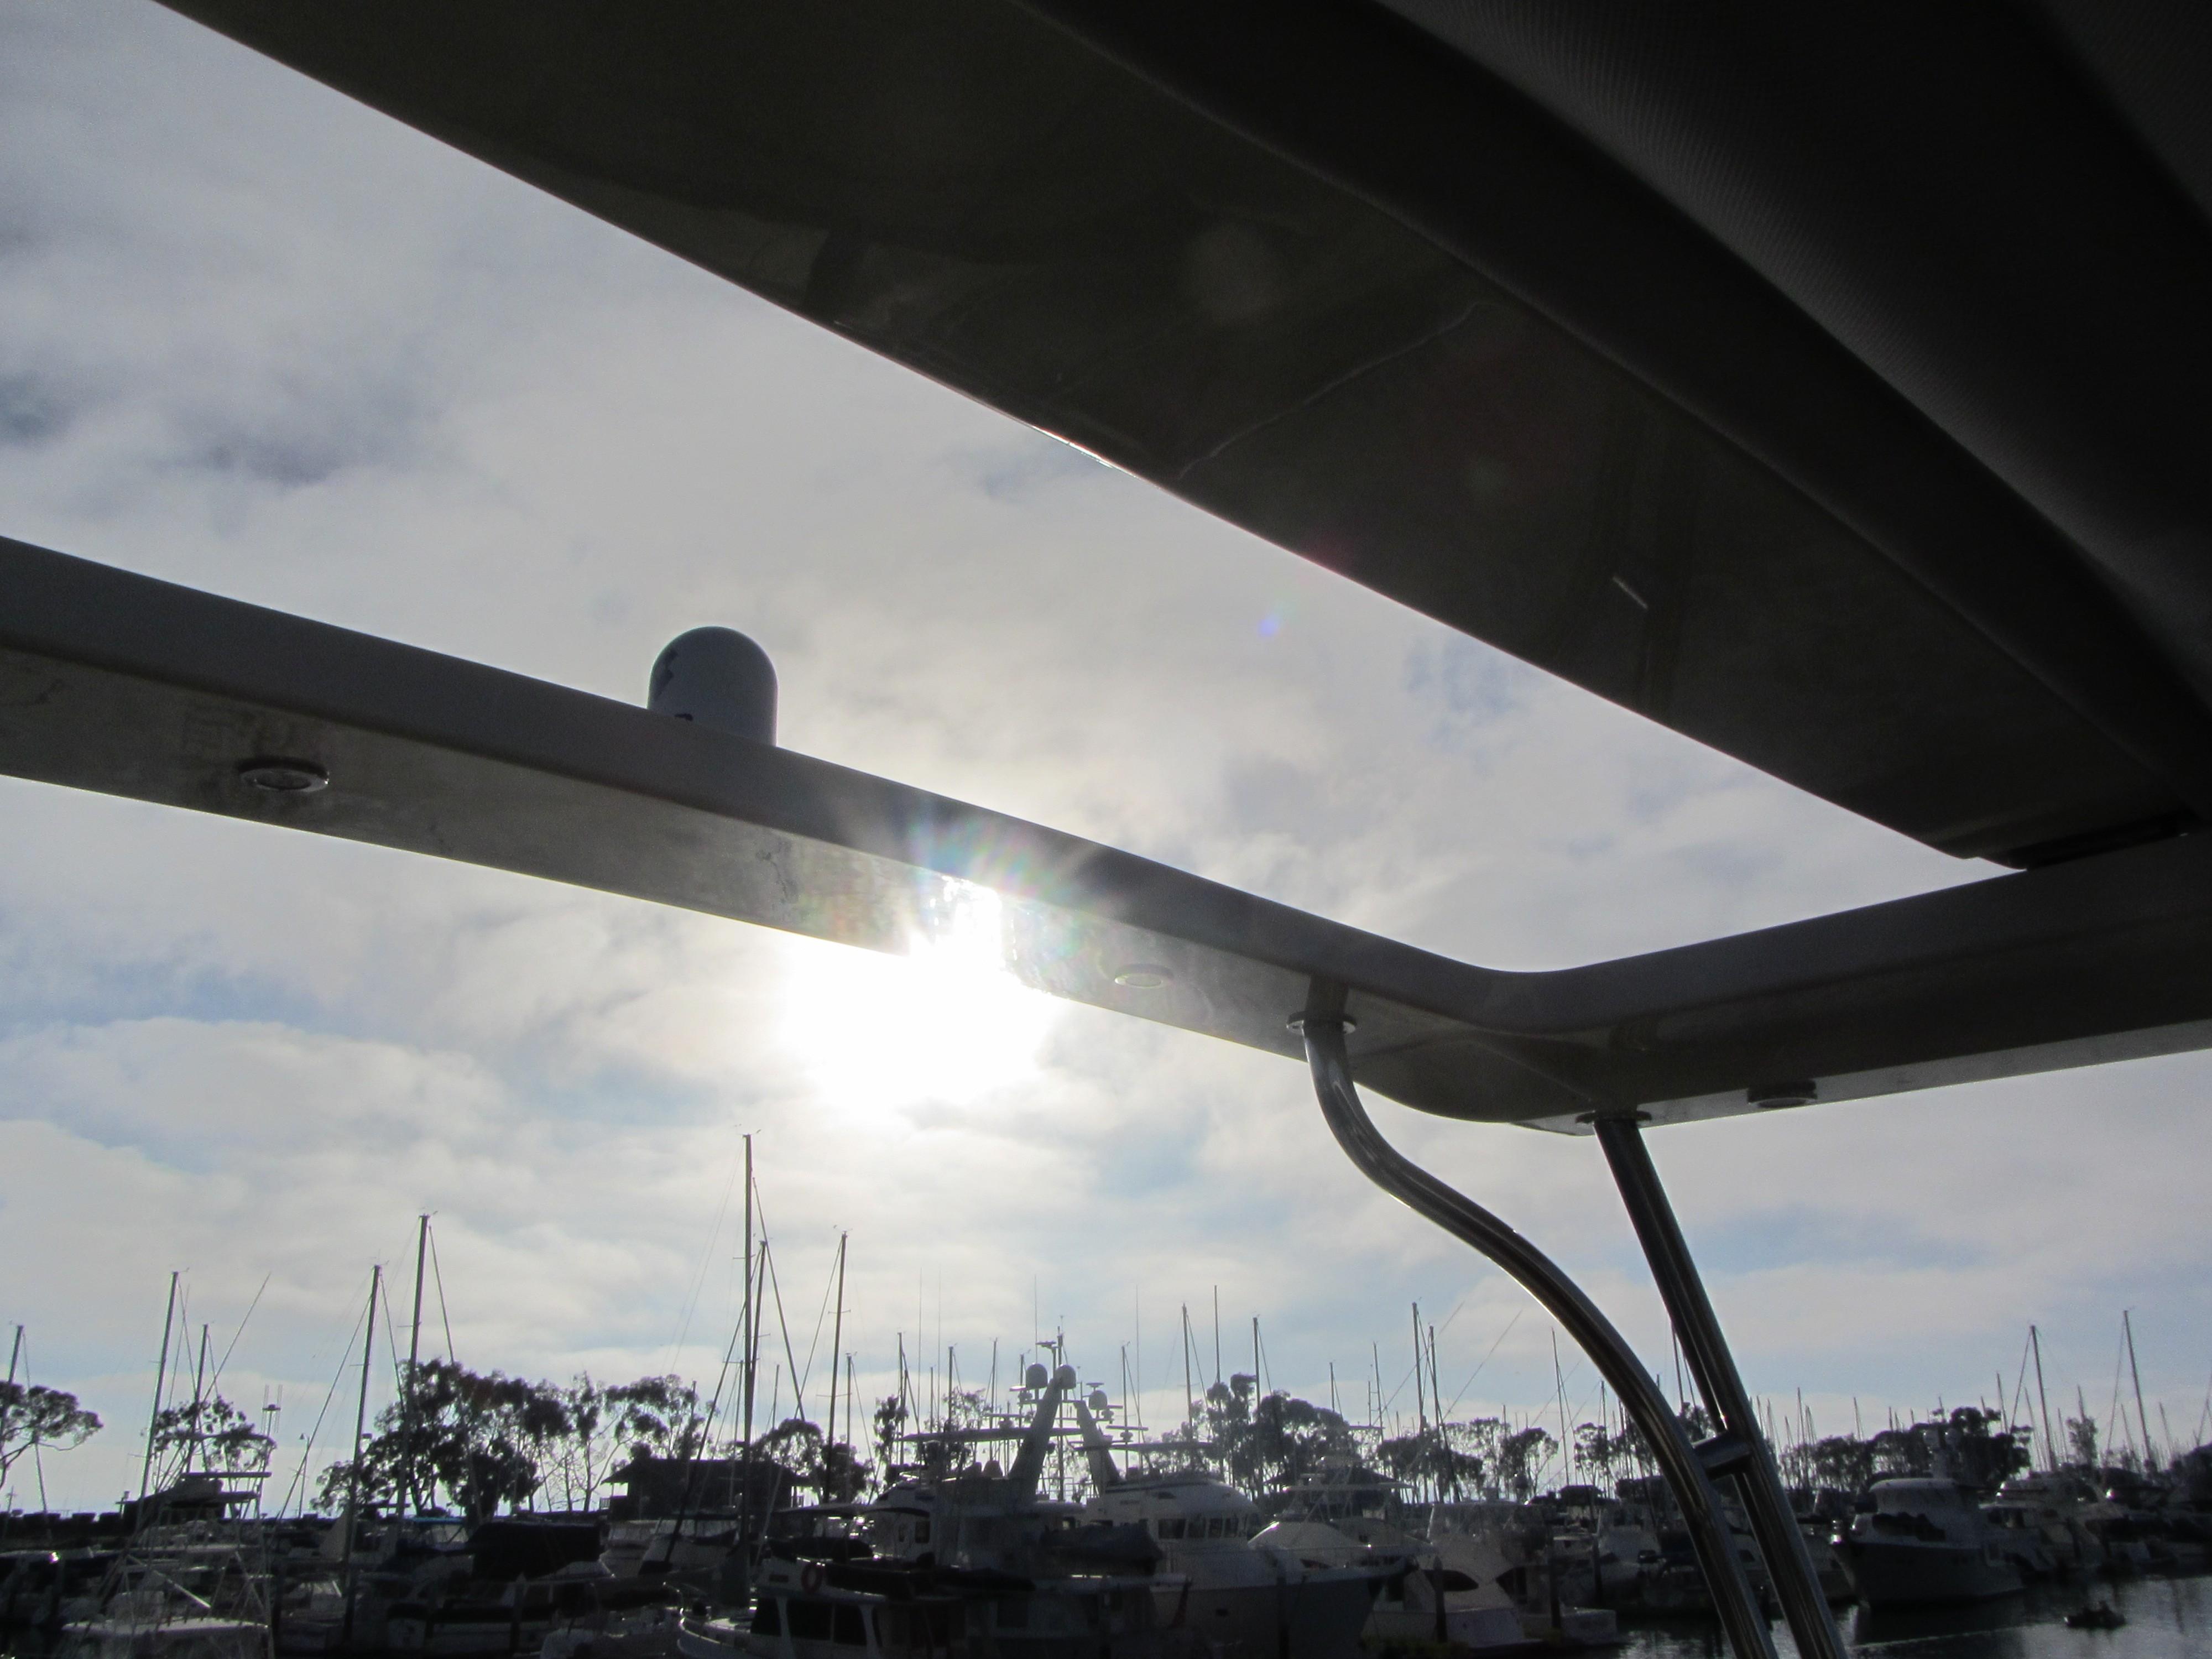 2016 Sea Ray L590 Fly #TB1509MC inventory image at Sun Country Coastal in Dana Point